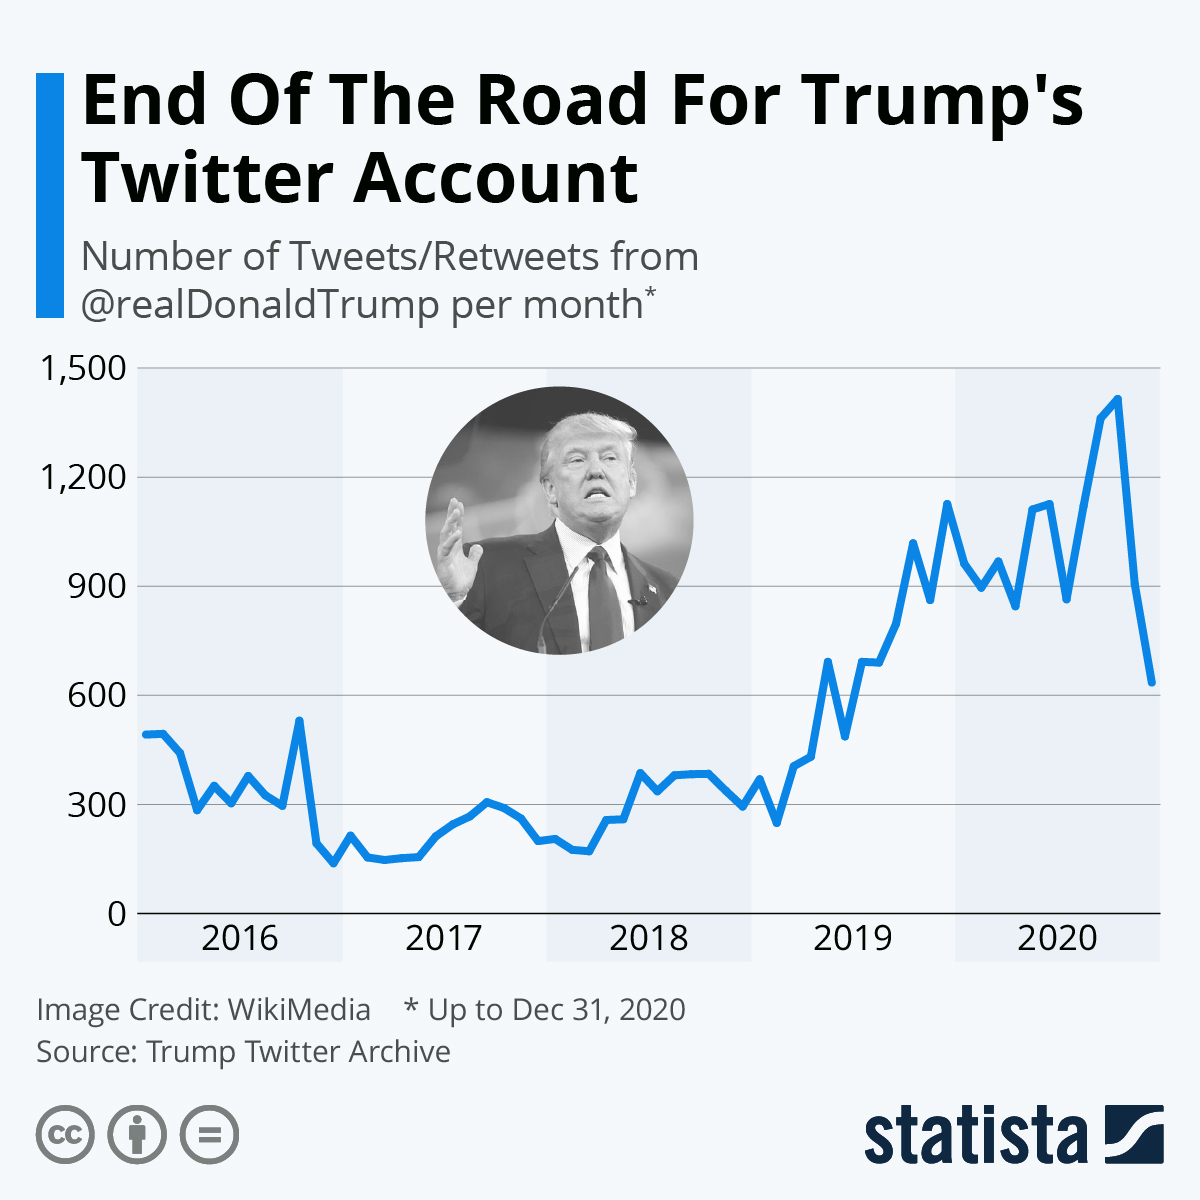 Твиты Трампа по годам. (Скриншот: Statista)